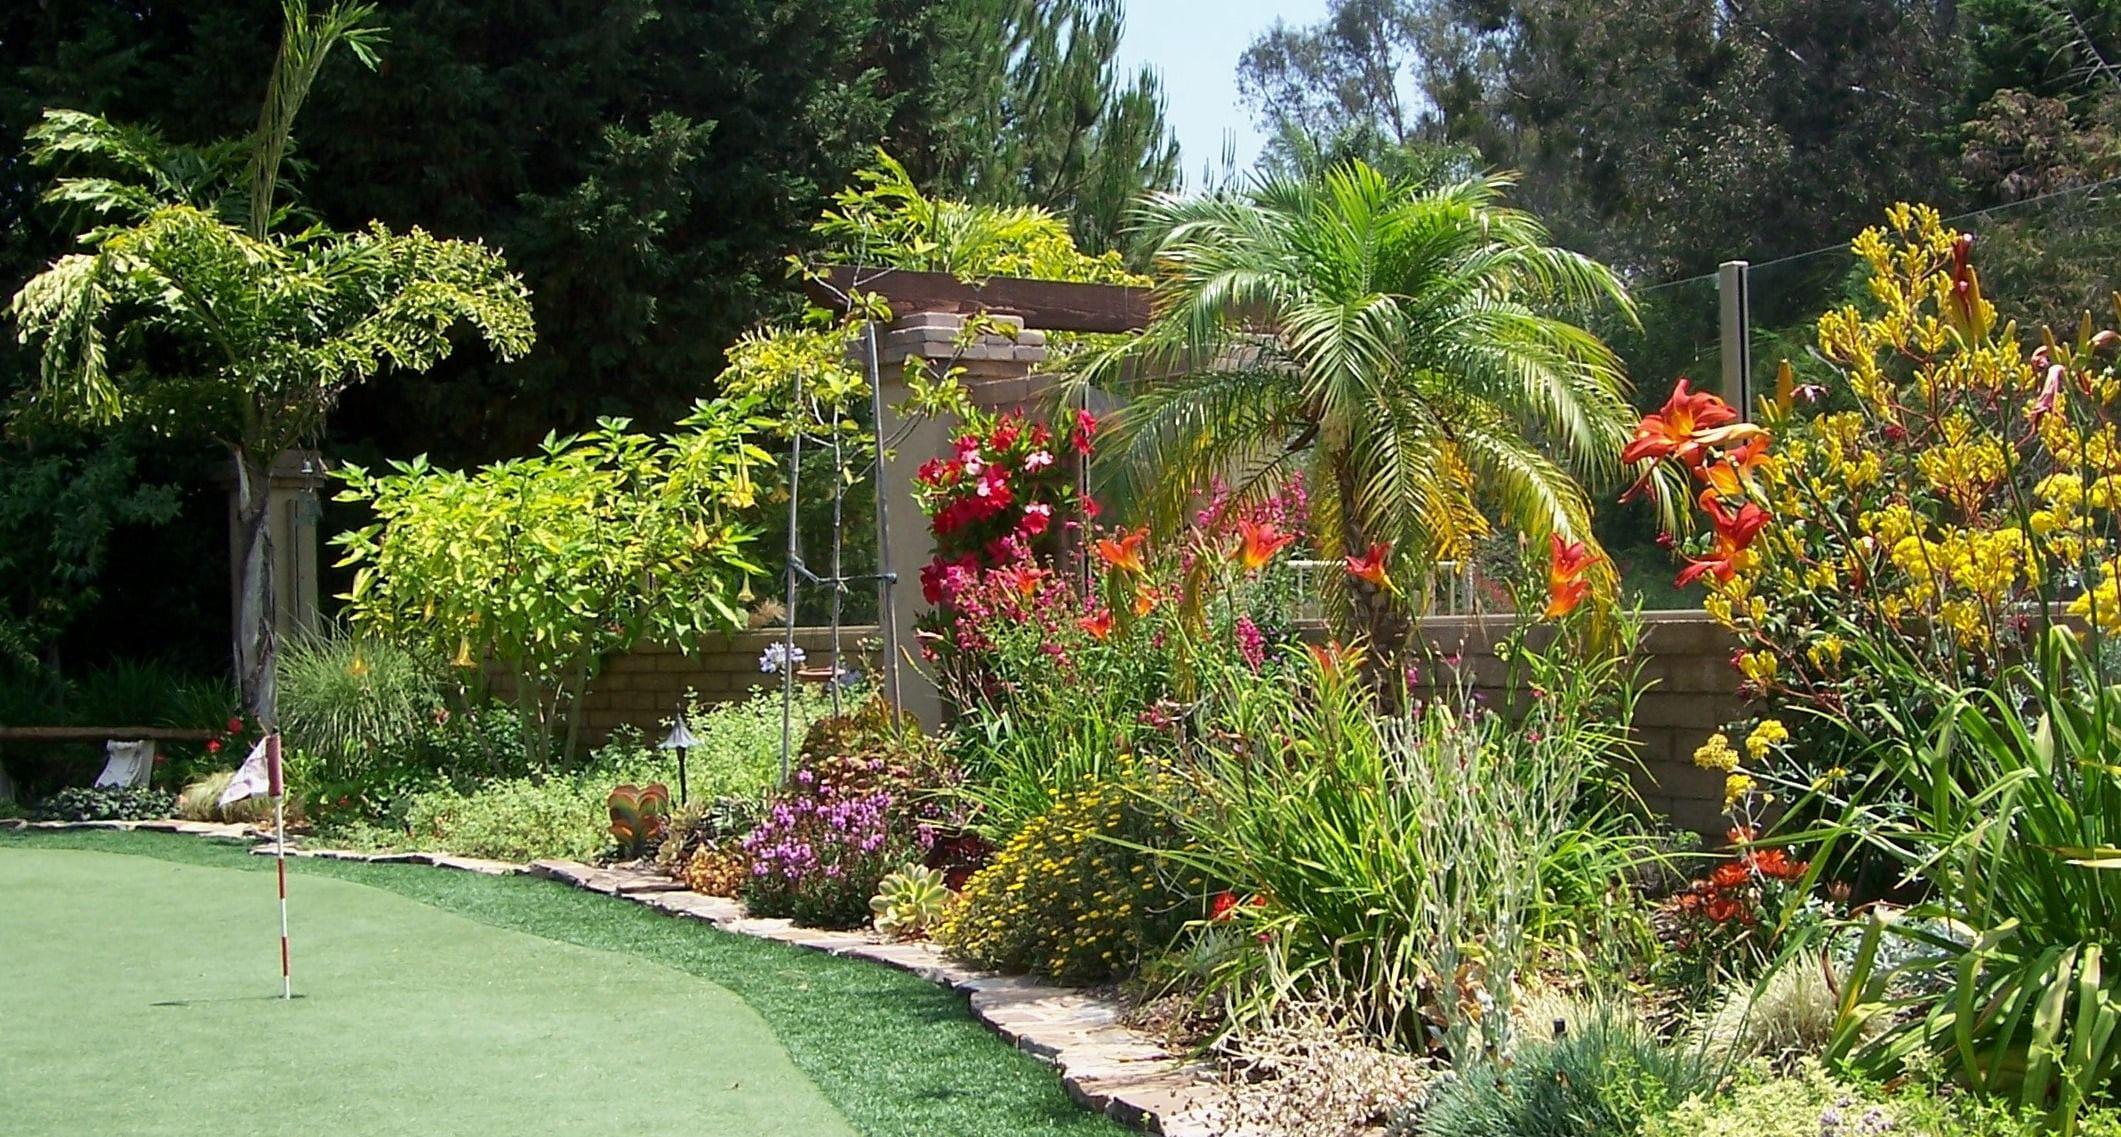 18.SIMPHOME.COM entrancing online landscape design courses in india and best online with backyard landscape design tool